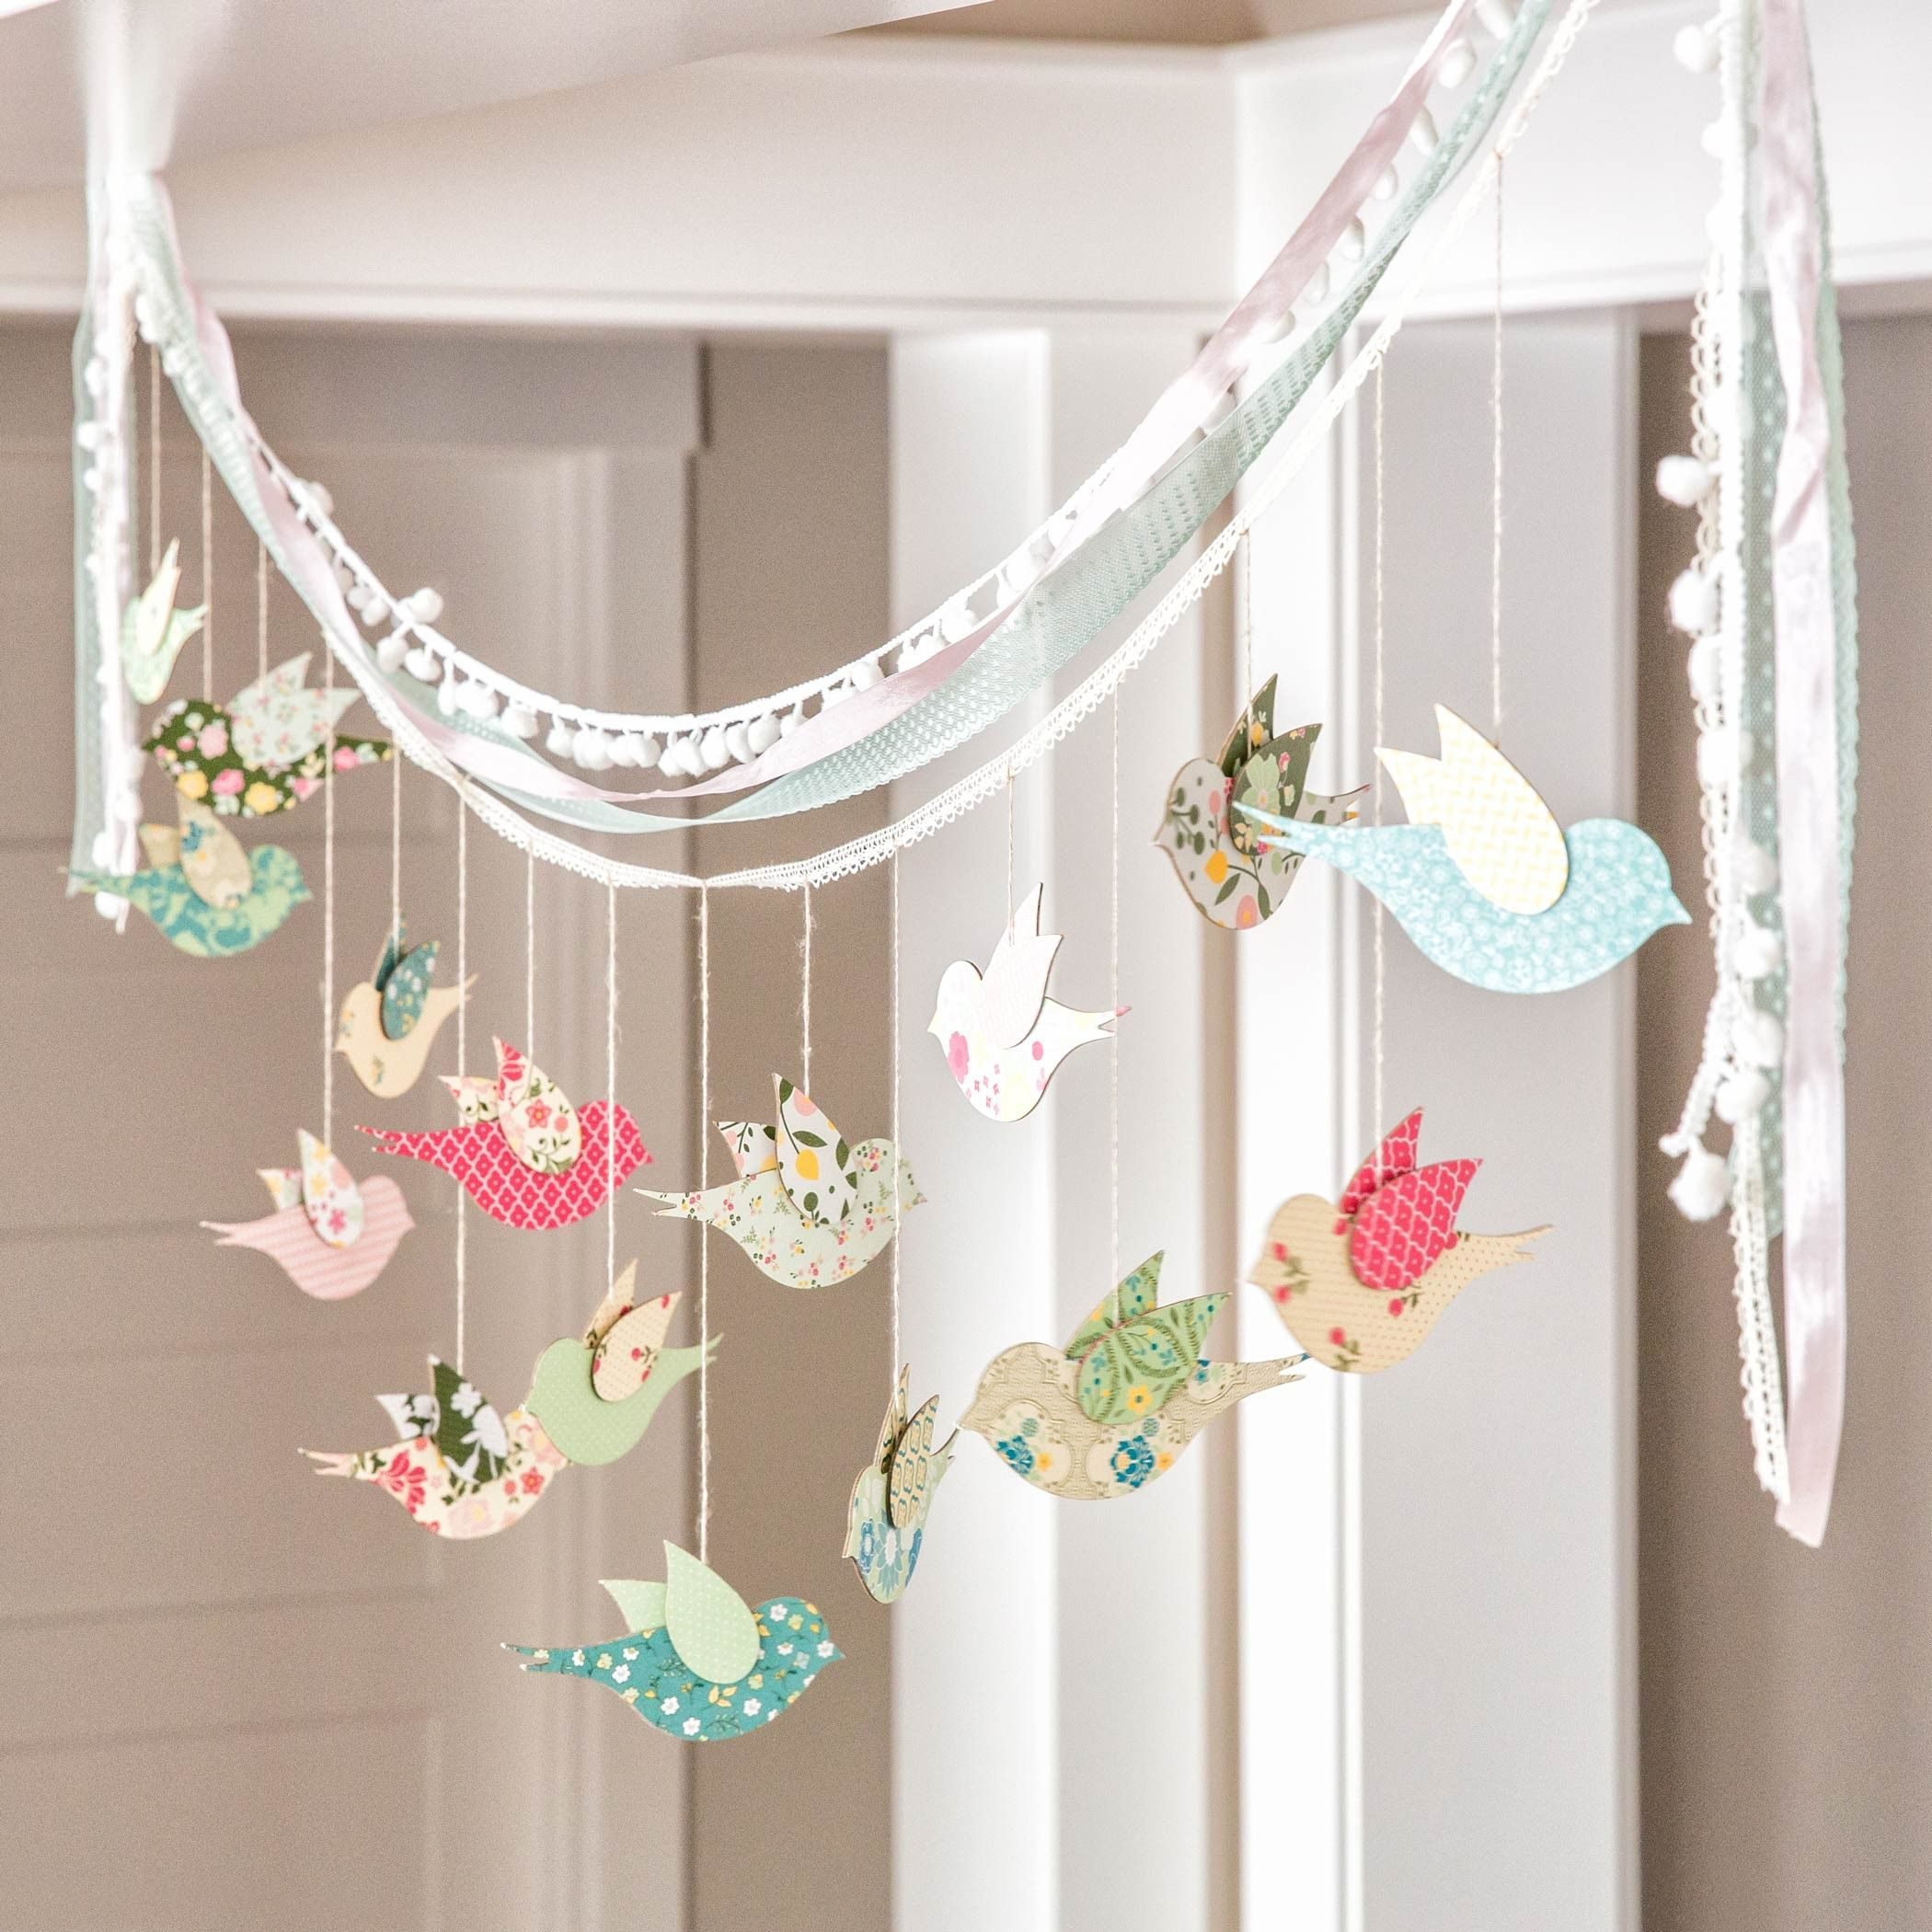 pretty design bird home decor. Beautiful DIY Bird Banner  Home Decor or party decor perfect for spring This Flock